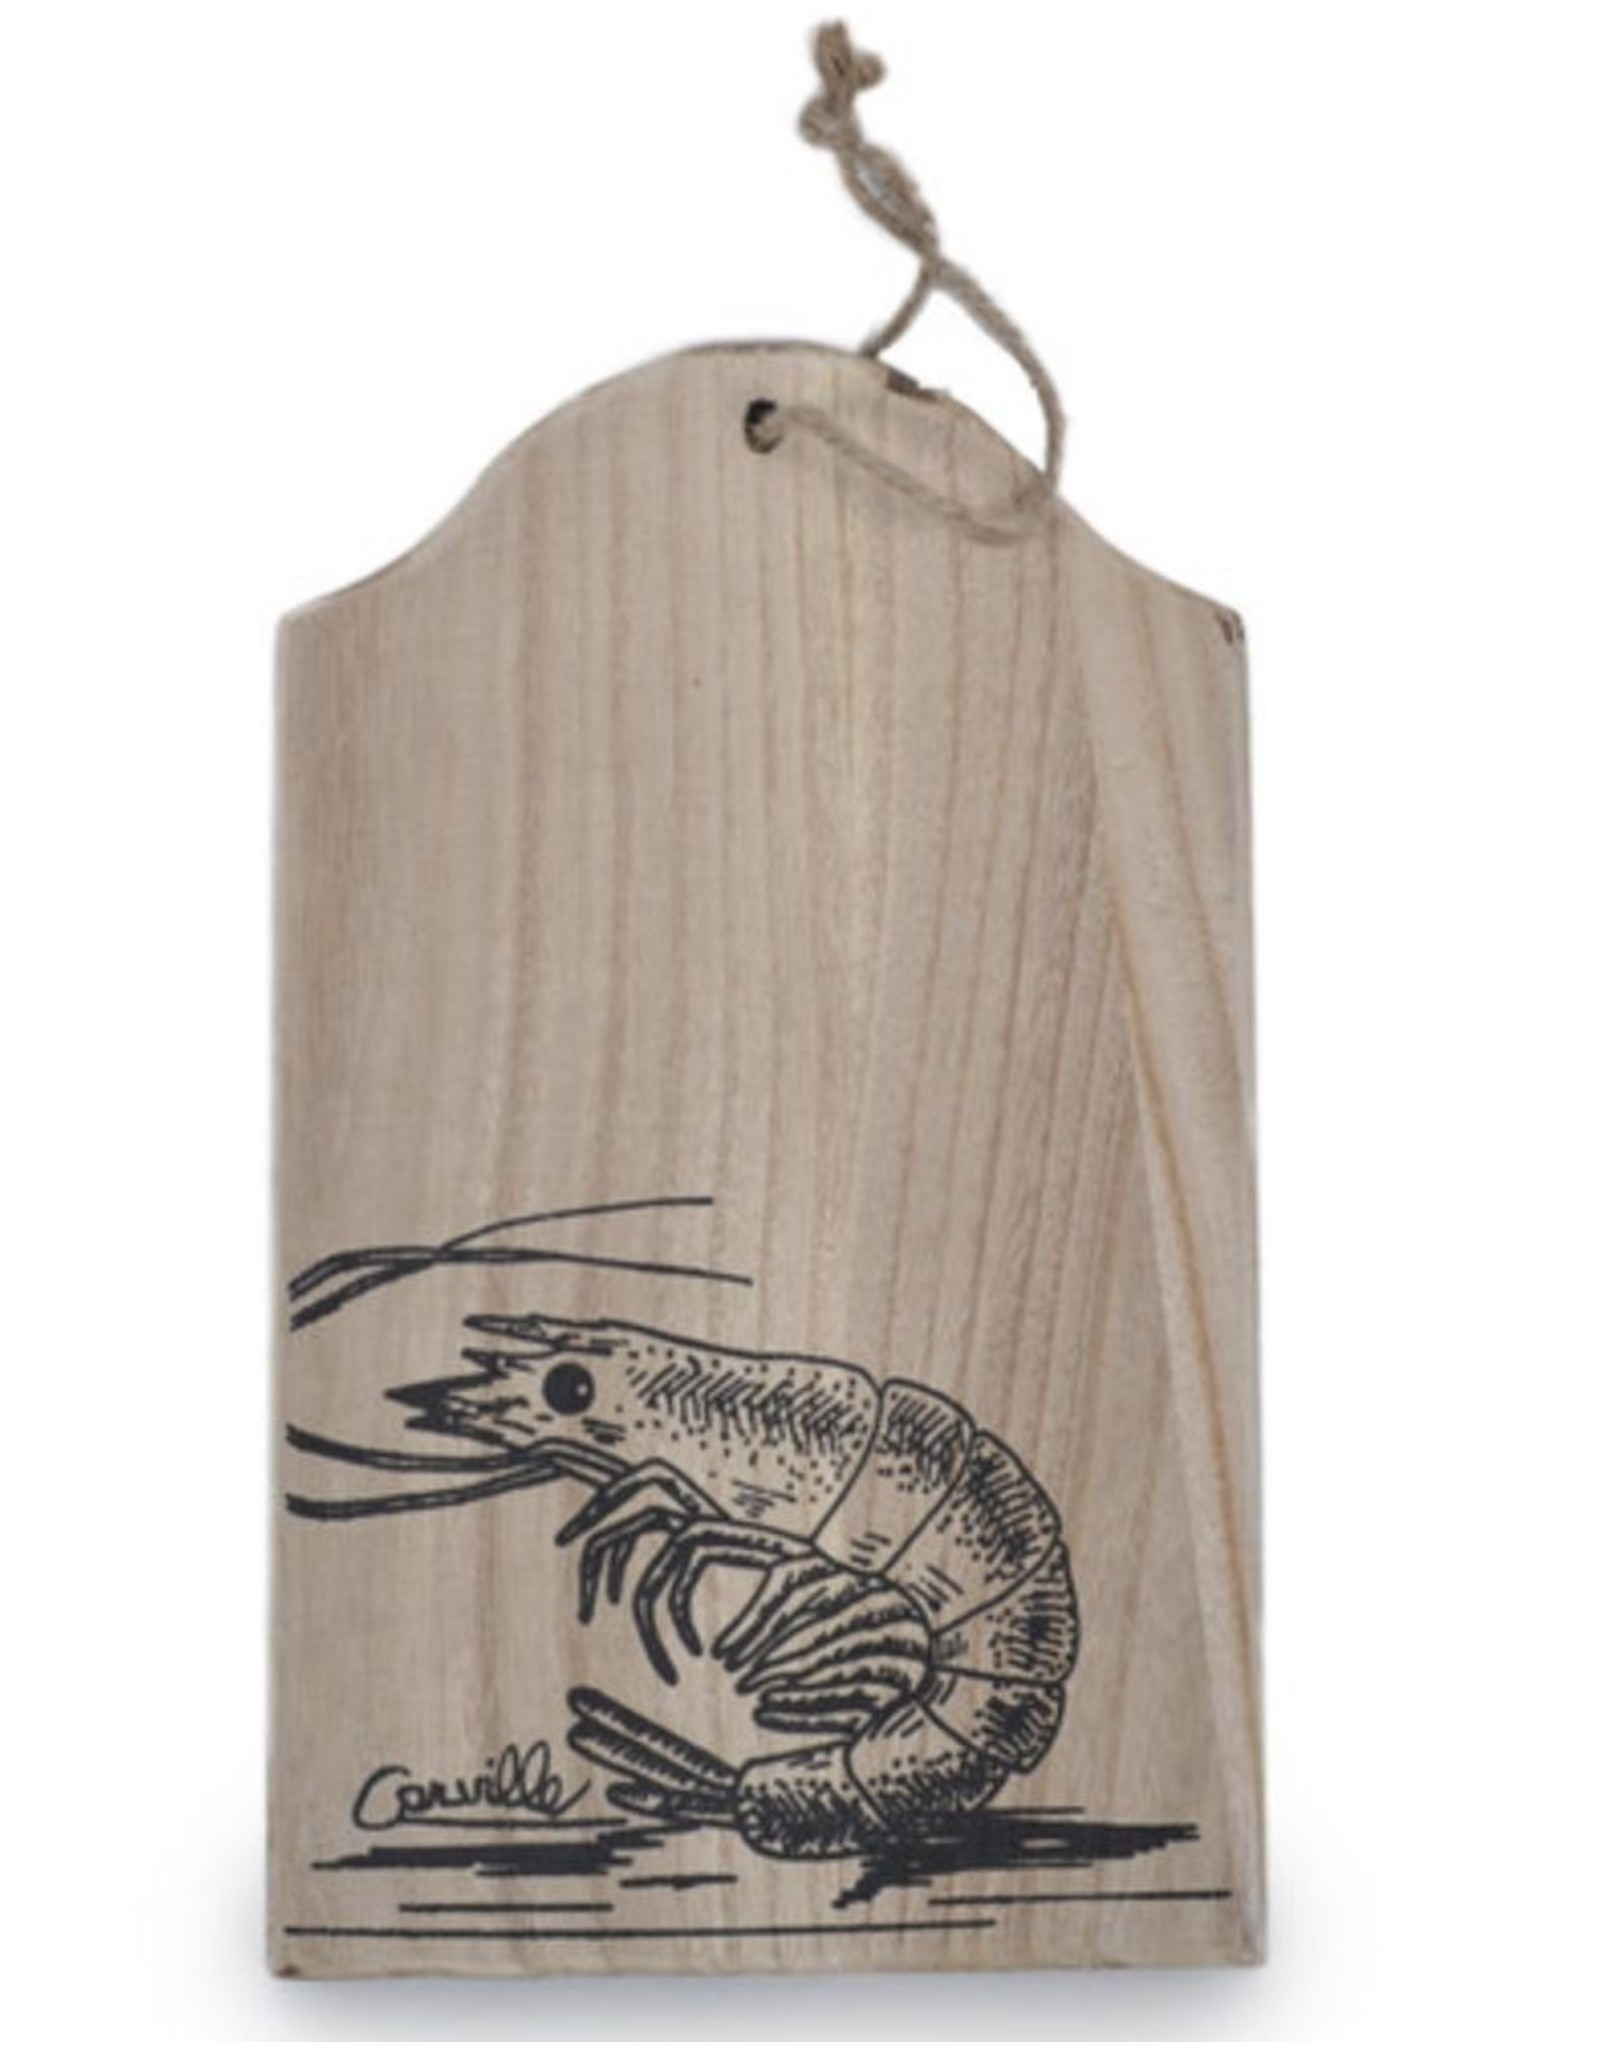 Roux Brand Decorative Wooden Board-Shrimp